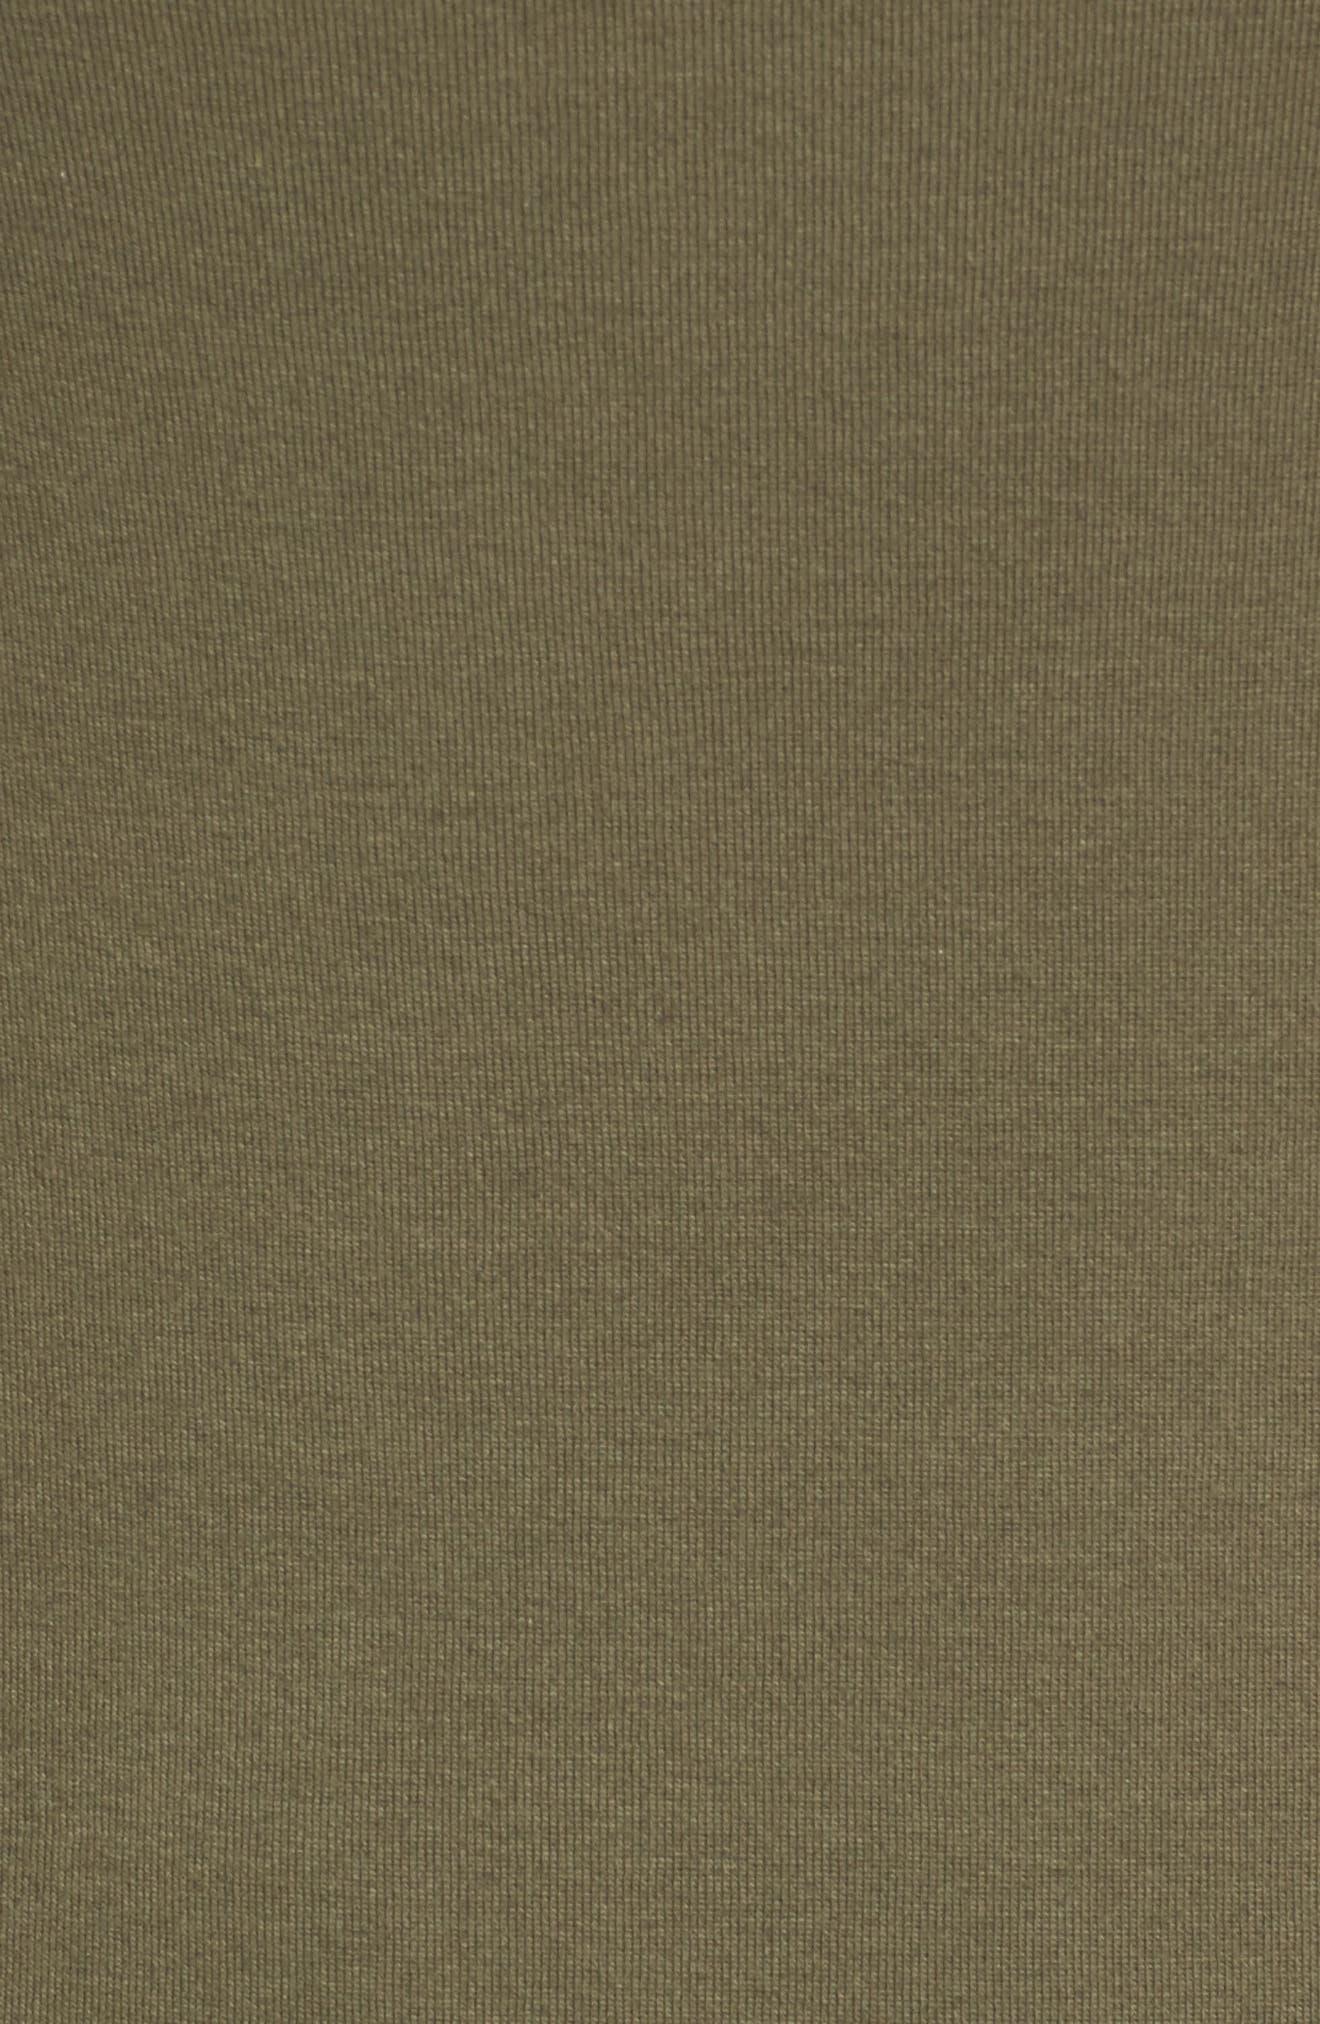 Short Sleeve Scoop Neck Tee,                             Alternate thumbnail 5, color,                             312